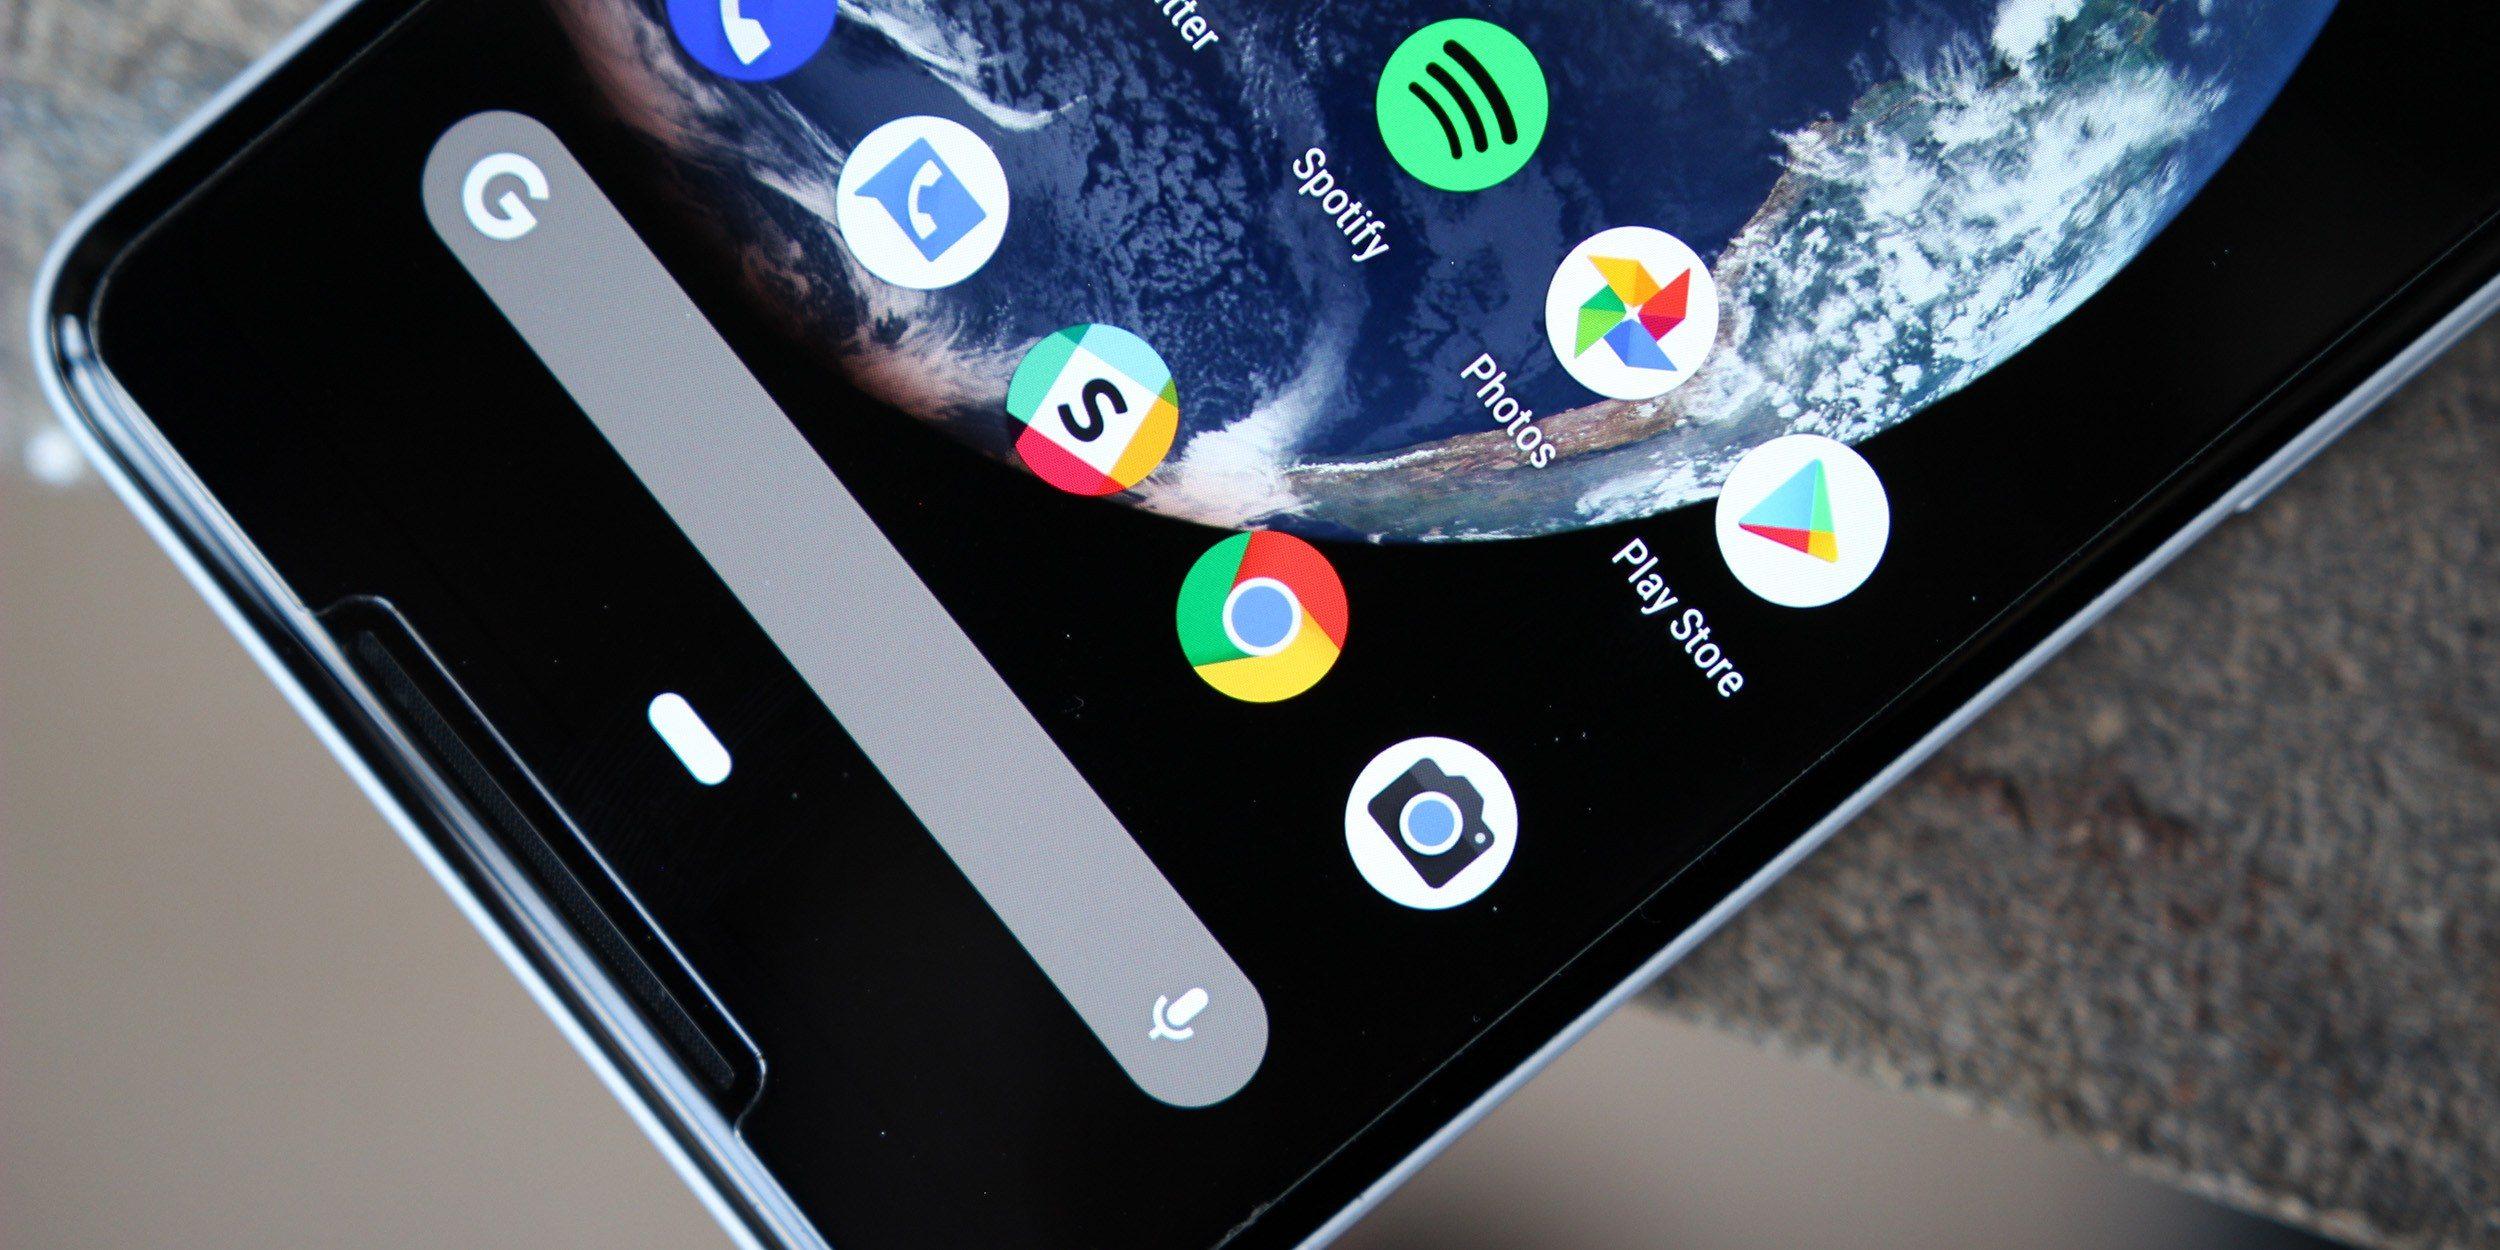 download Google Chrome 74 APK